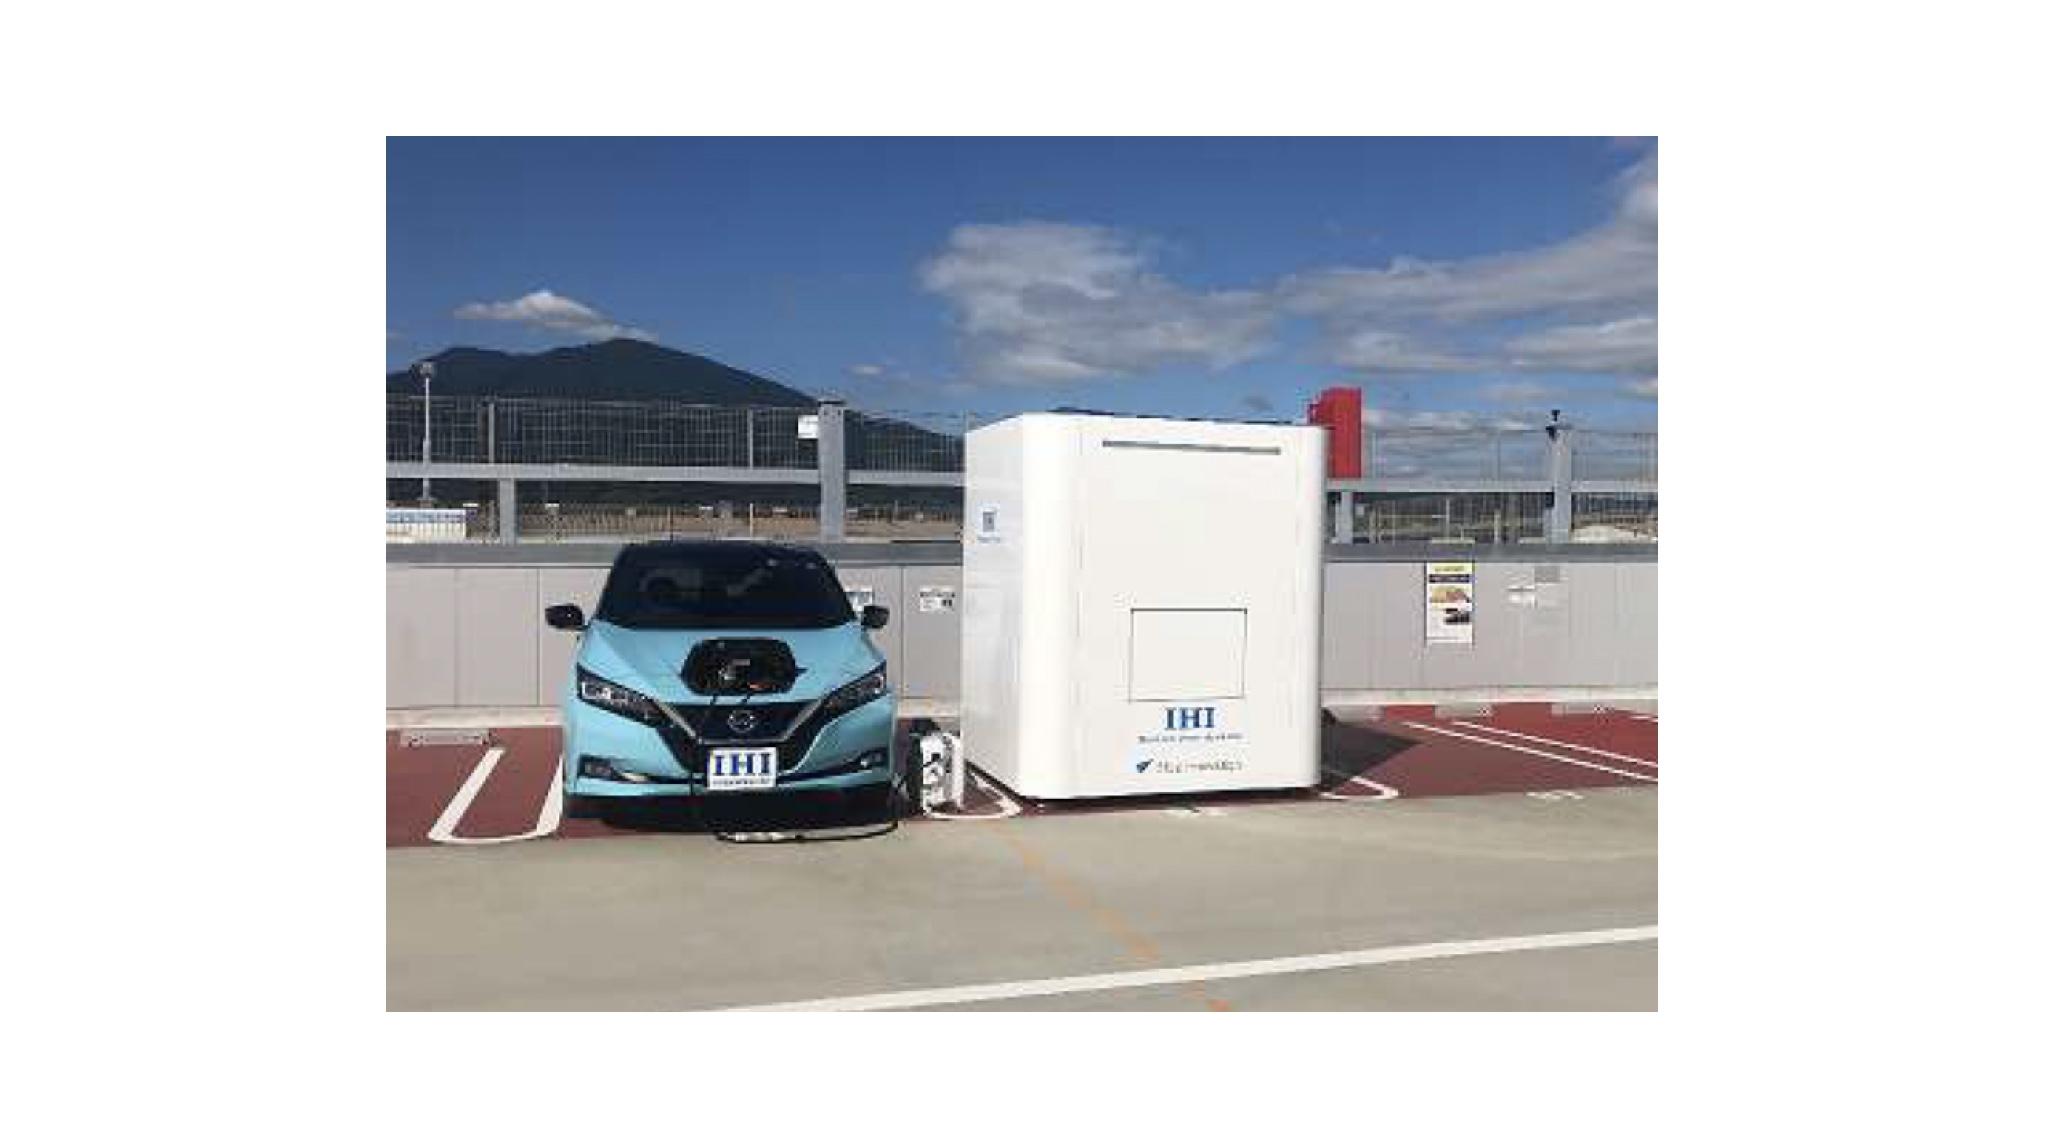 IHI×ブルーイノベーション|国内初、ドローンから自動運転モビリティへの荷物の無人受け渡しを実現